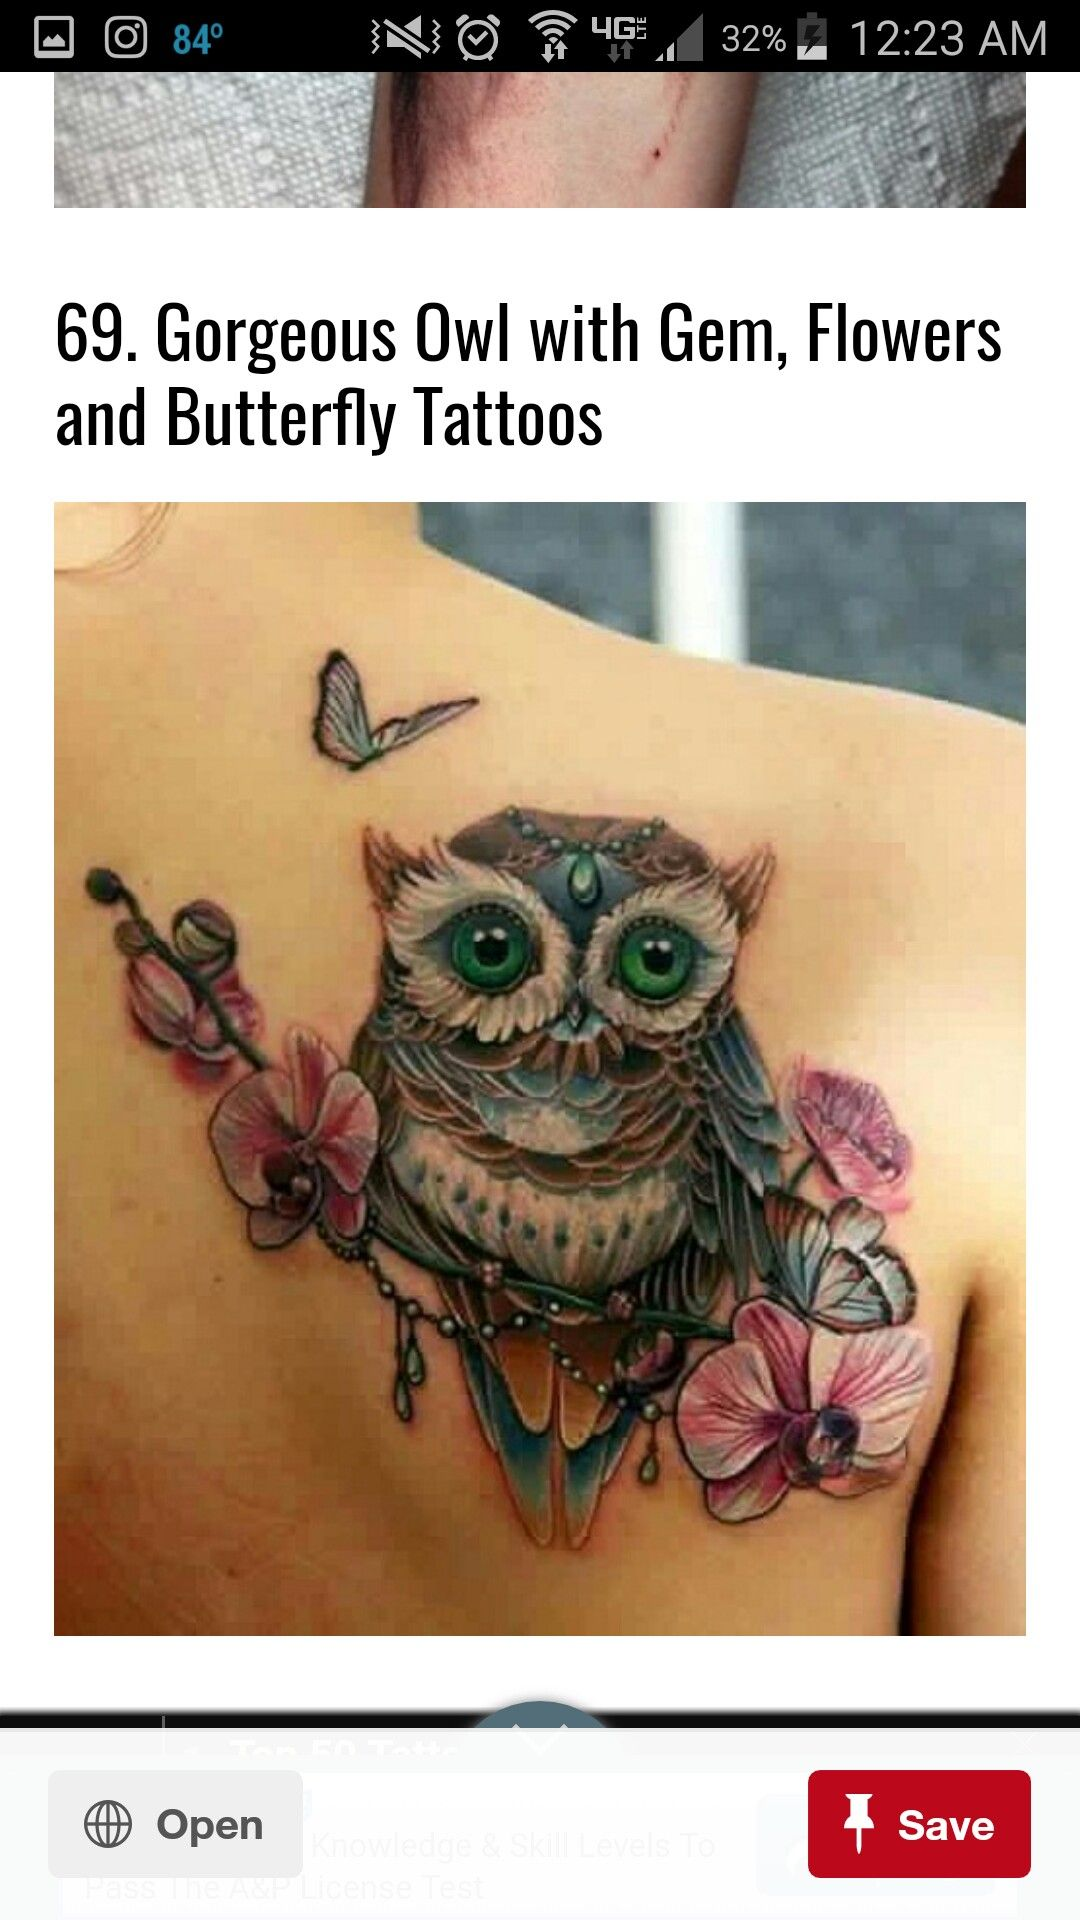 Tattoo ideas for guys on ribs pin by harley killbride on tattoos  pinterest  tattoo